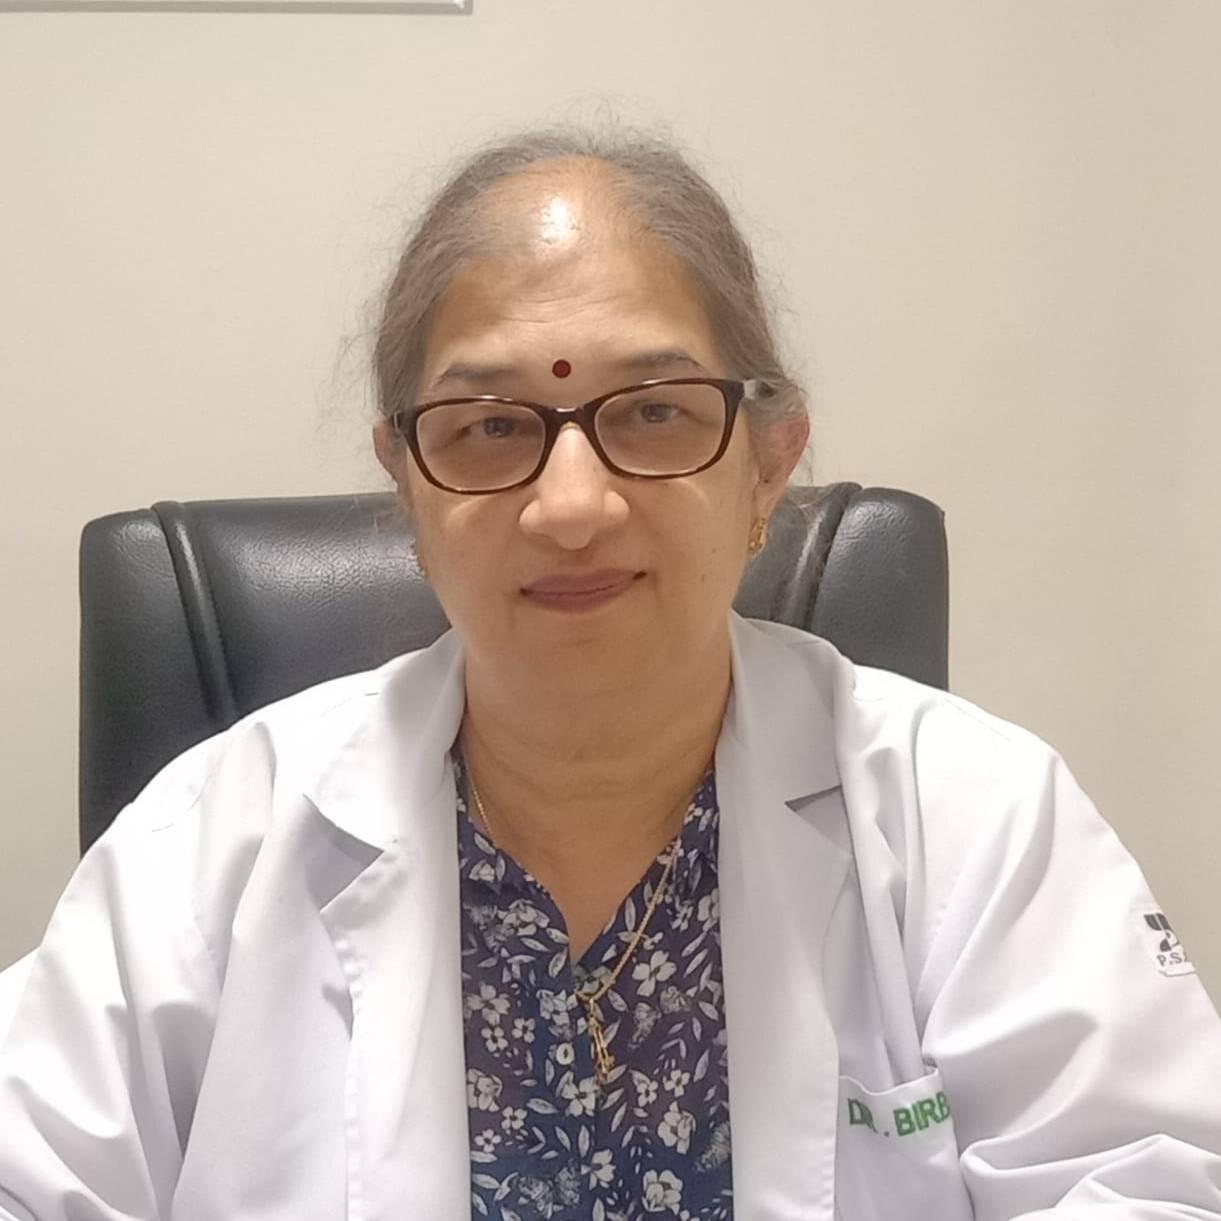 Dr. Birbala Rai